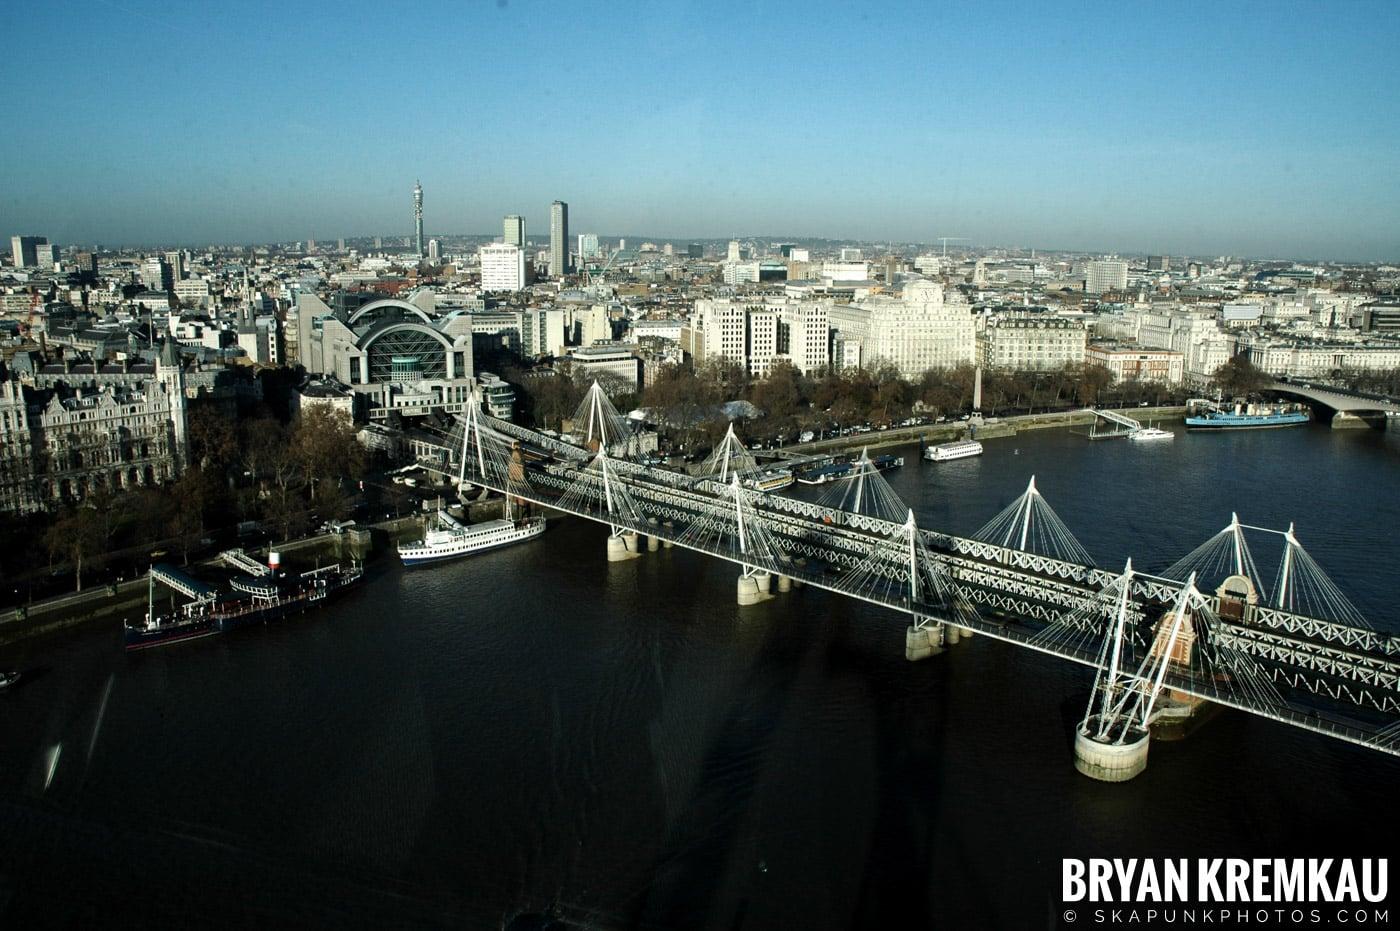 London, England - Day 4 - 12.19.05 (36)